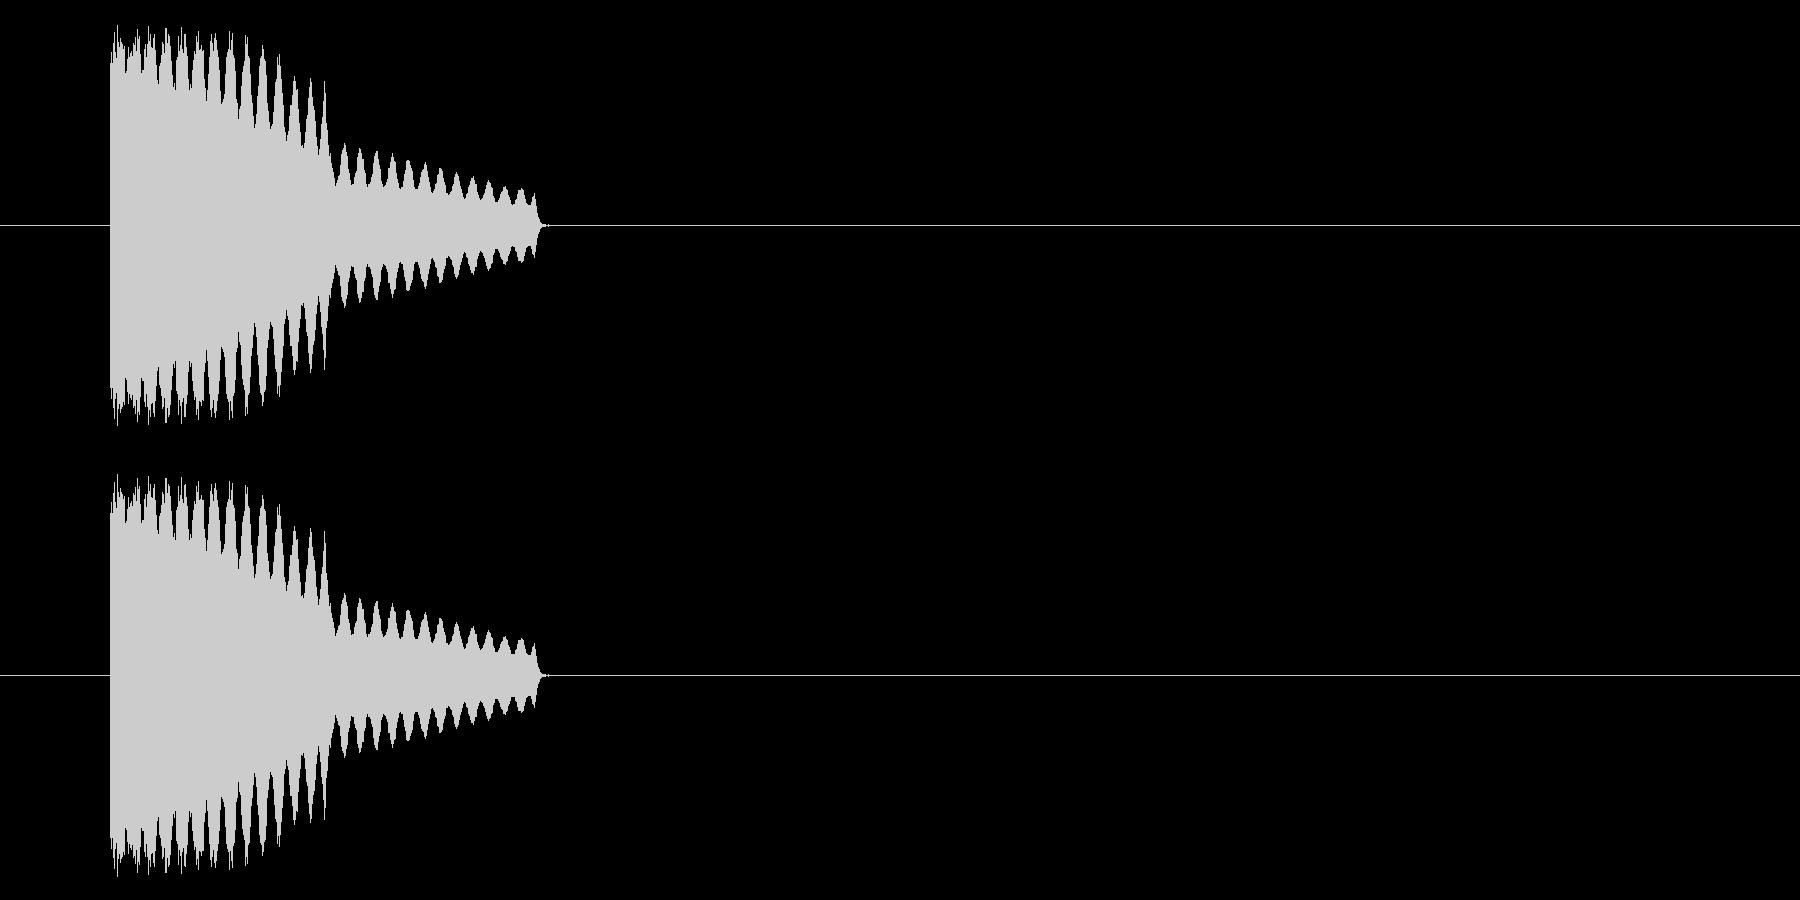 【GB 汎用02-02(ピッチ)】 の未再生の波形